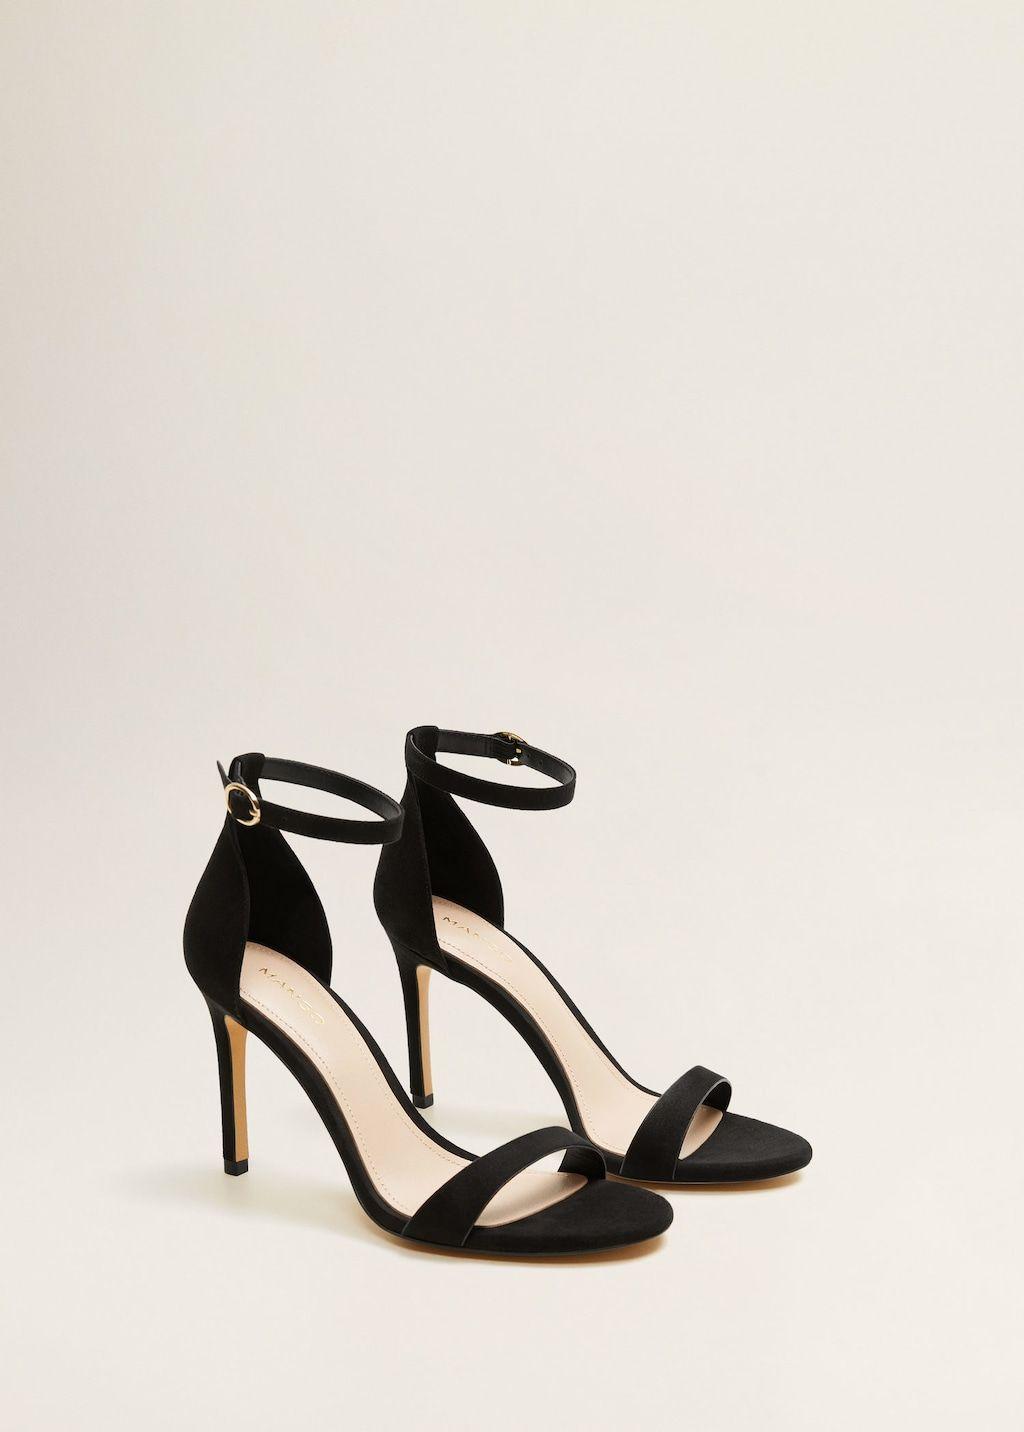 1c72f0f6d9f14b Reiss Garbo Metallic High Heeled Strappy Sandals at John Lewis   Partners